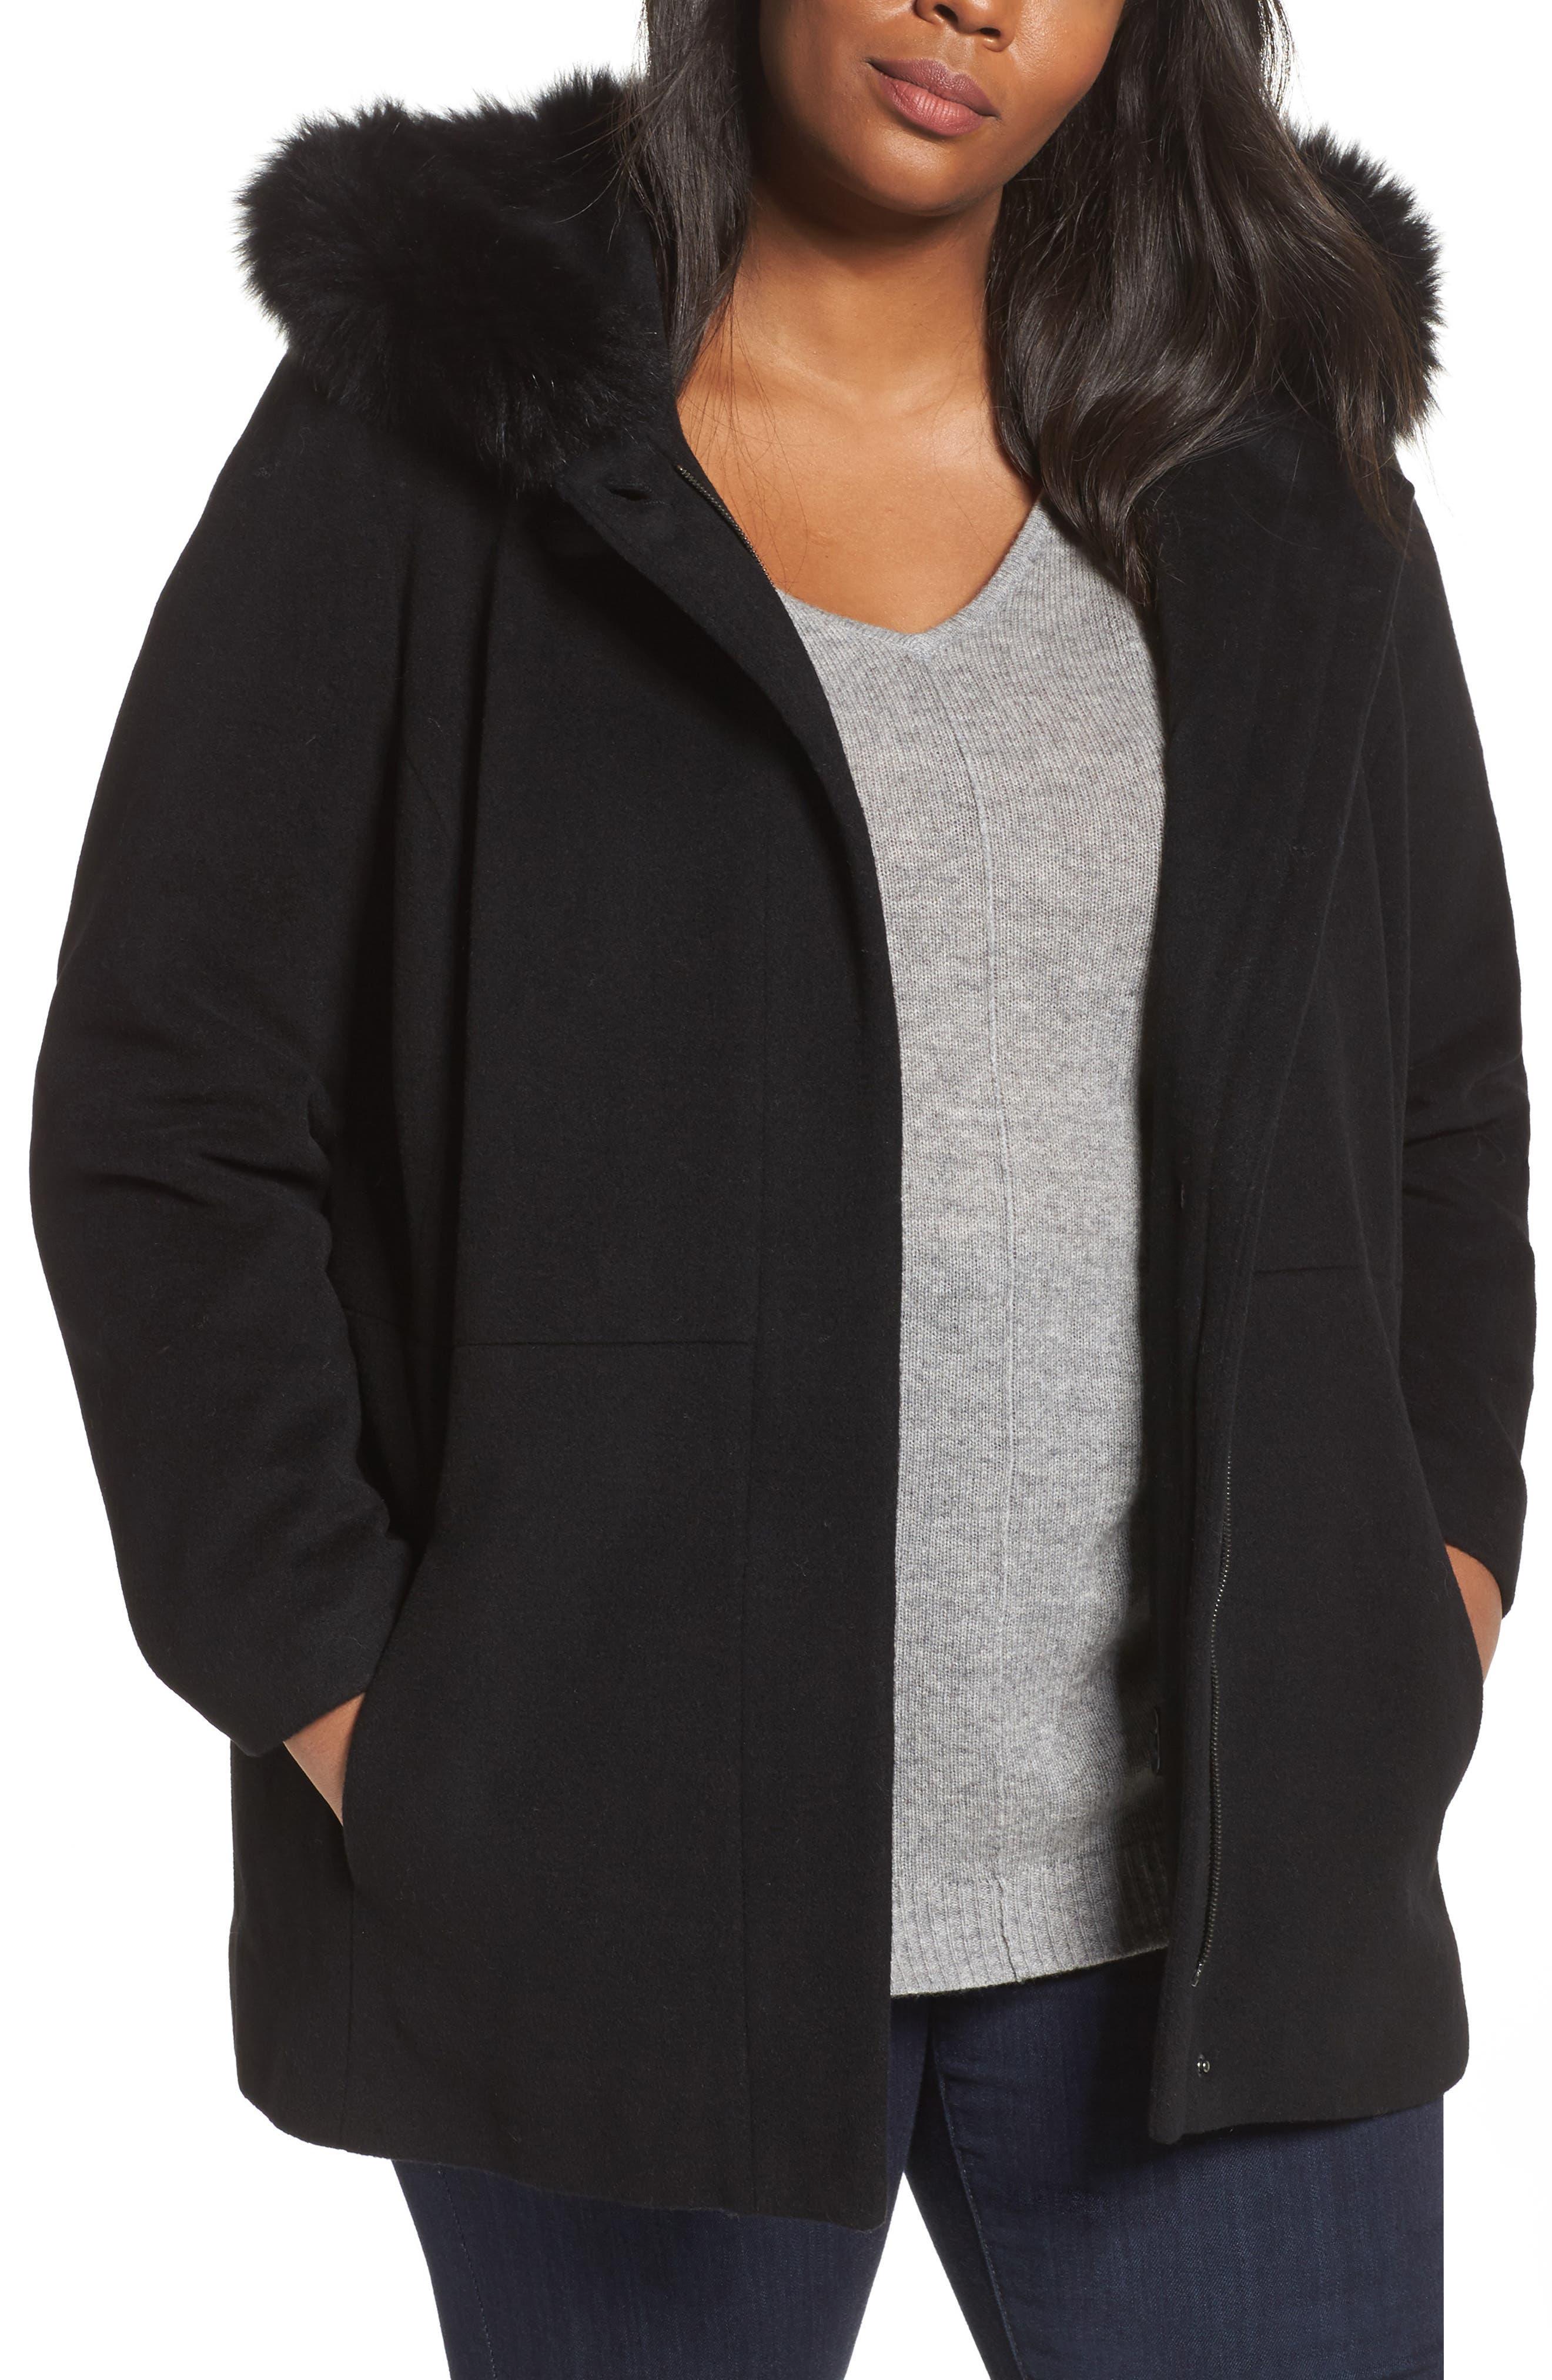 Alternate Image 1 Selected - Sachi Genuine Fox Fur Trim Hooded Wool Blend Jacket (Plus Size)